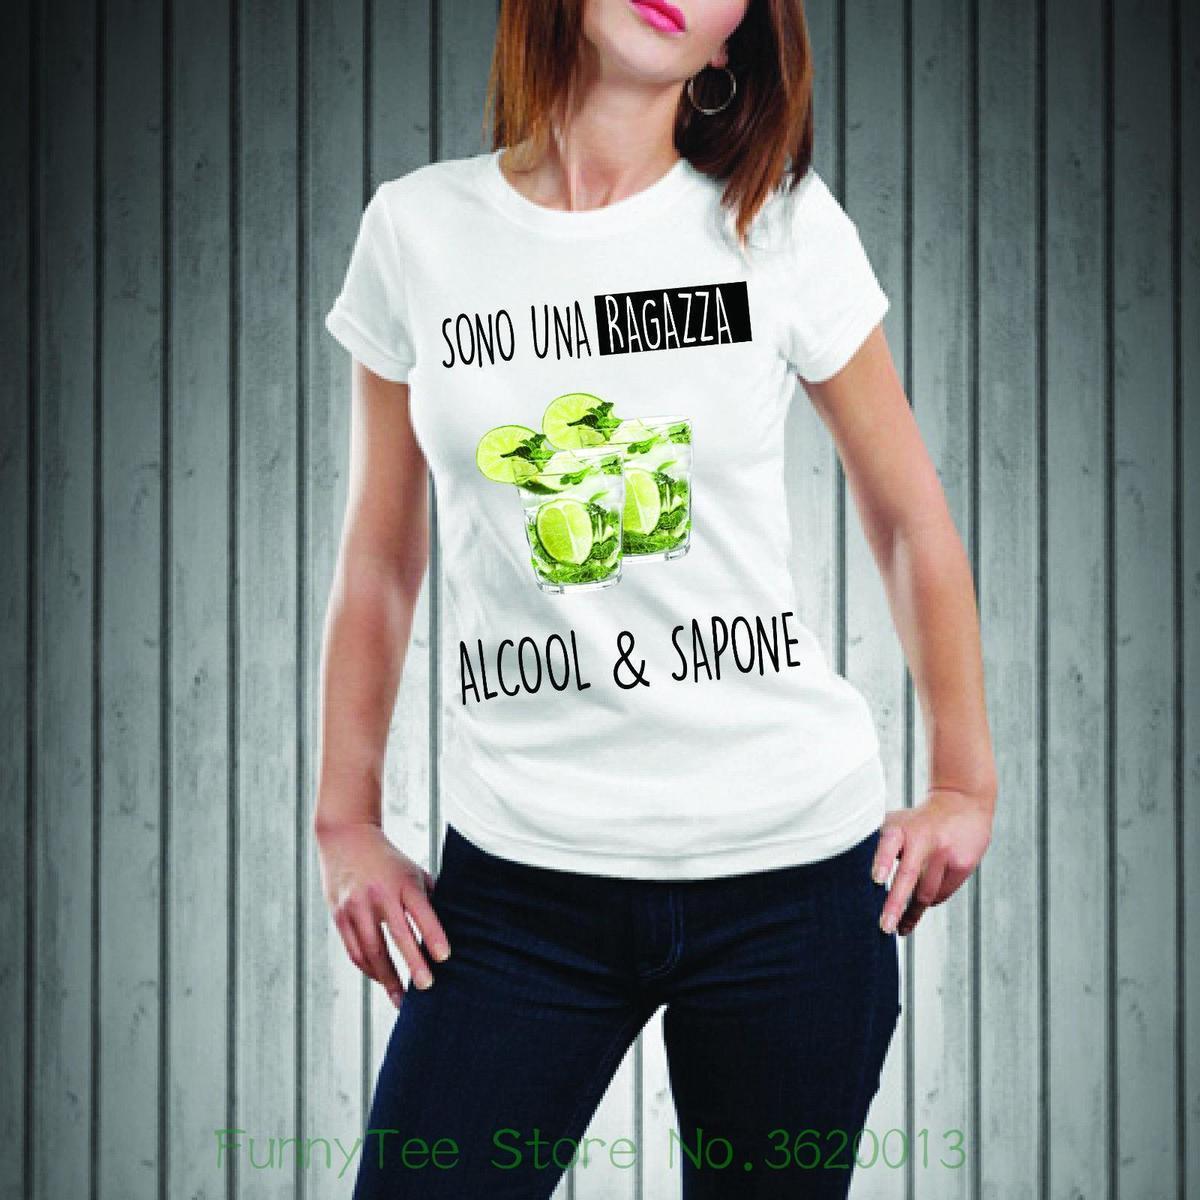 4c48286503 Women'S Tee T Shirt T Shirt Donna Happiness Divertente Mojito Ragazza  Alcool E Sapone Punk Harajuku Unicorn Brand Tops Tee Cotton T Shirts Fitted  Shirts ...